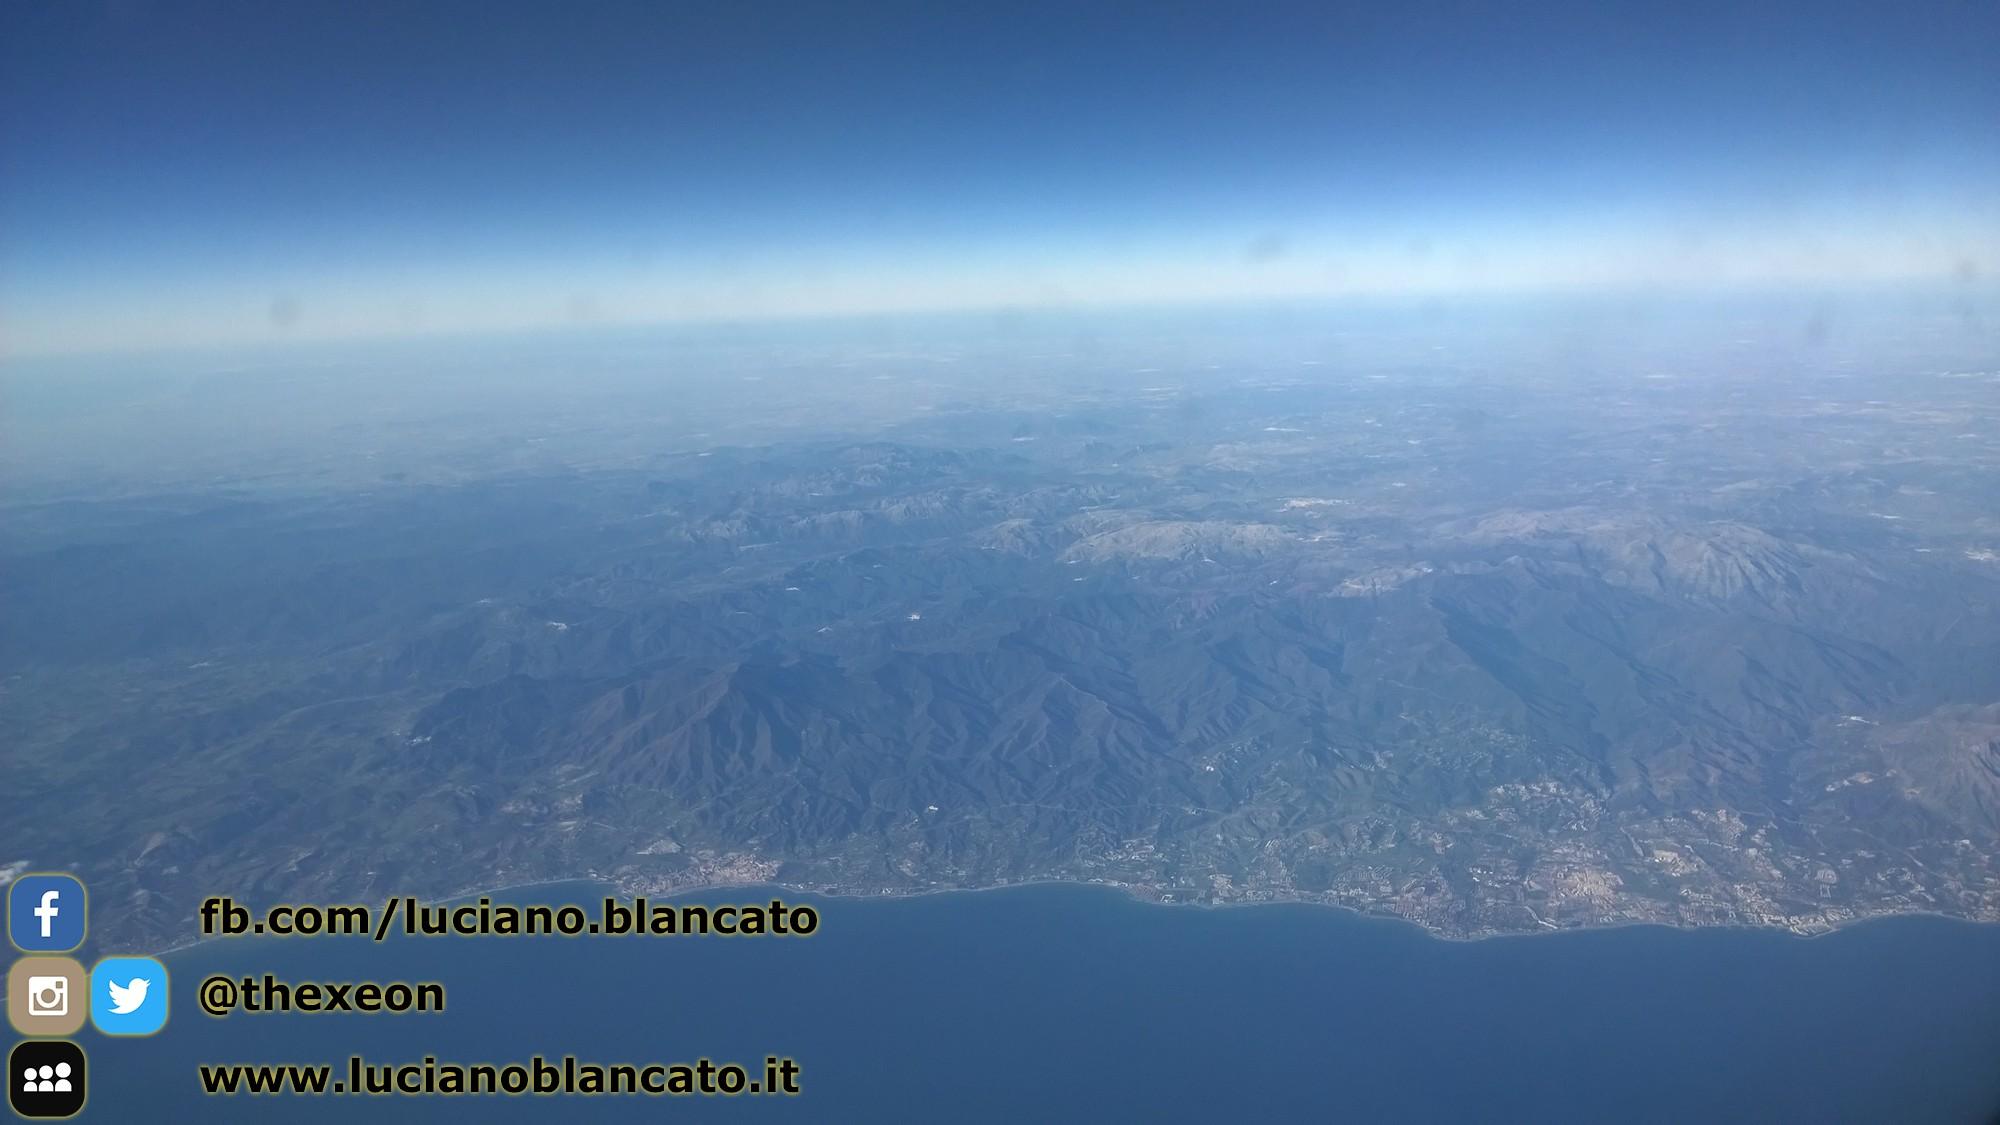 Fuerteventura - Spagna - 2014 - foto n. 0031